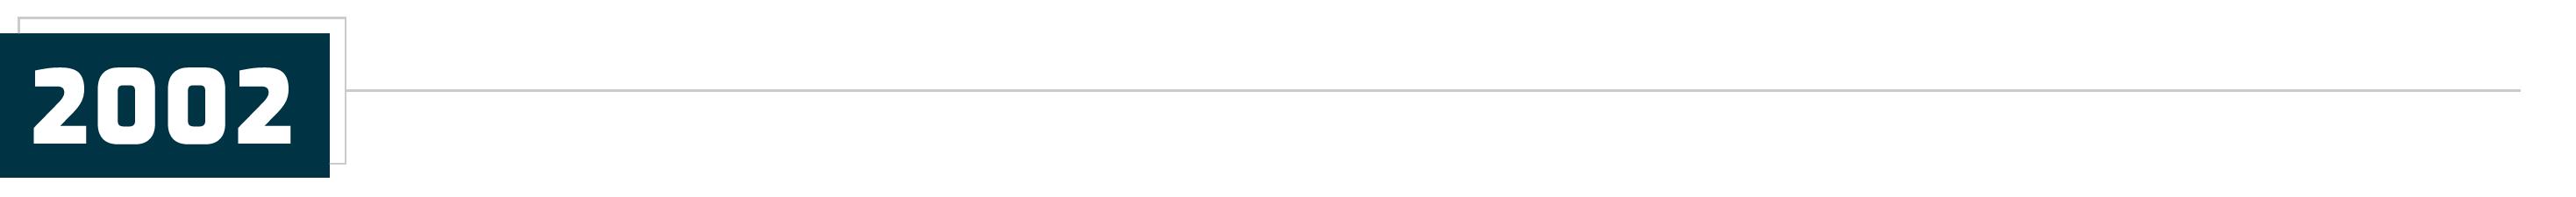 Choice Bank Timeline 2002